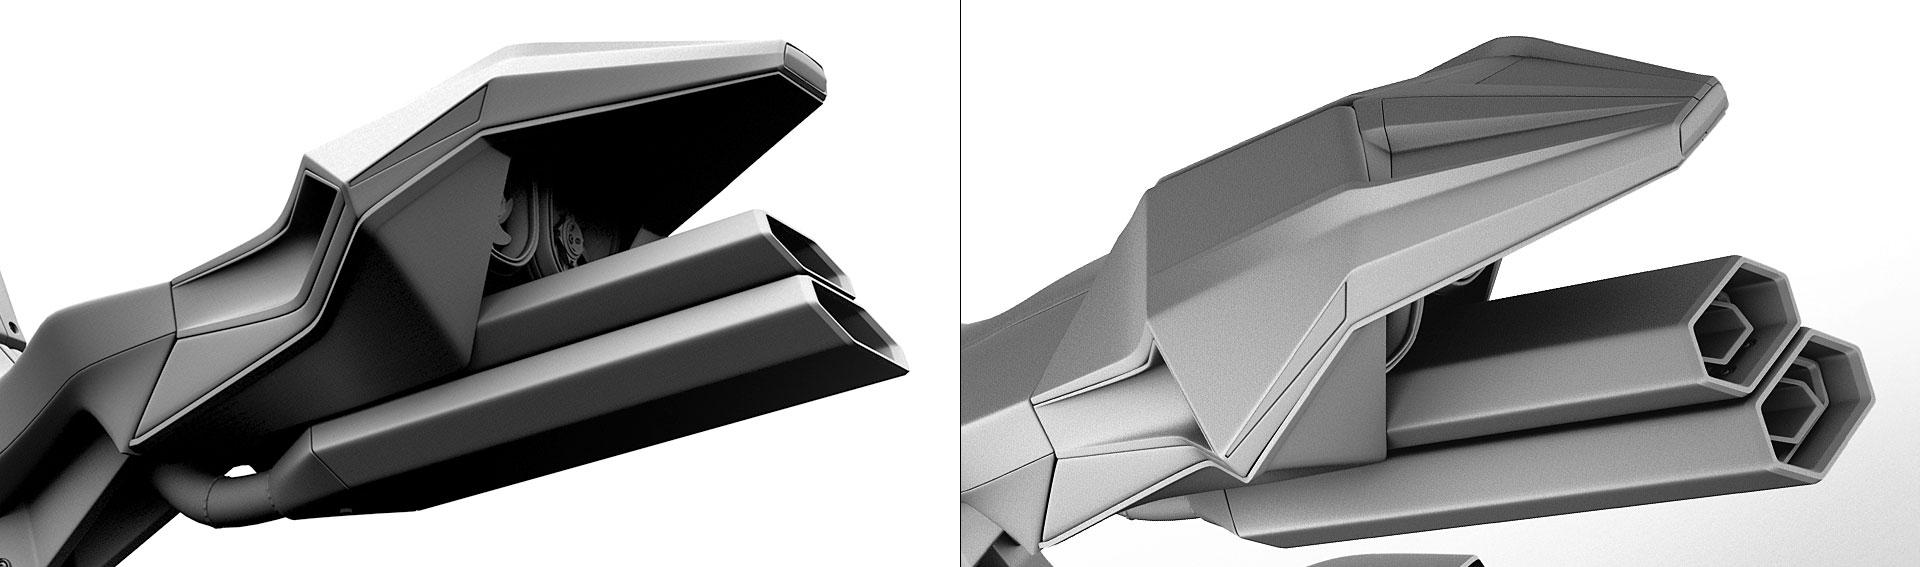 Machete-Concept-Motorbike-Nitin-Design